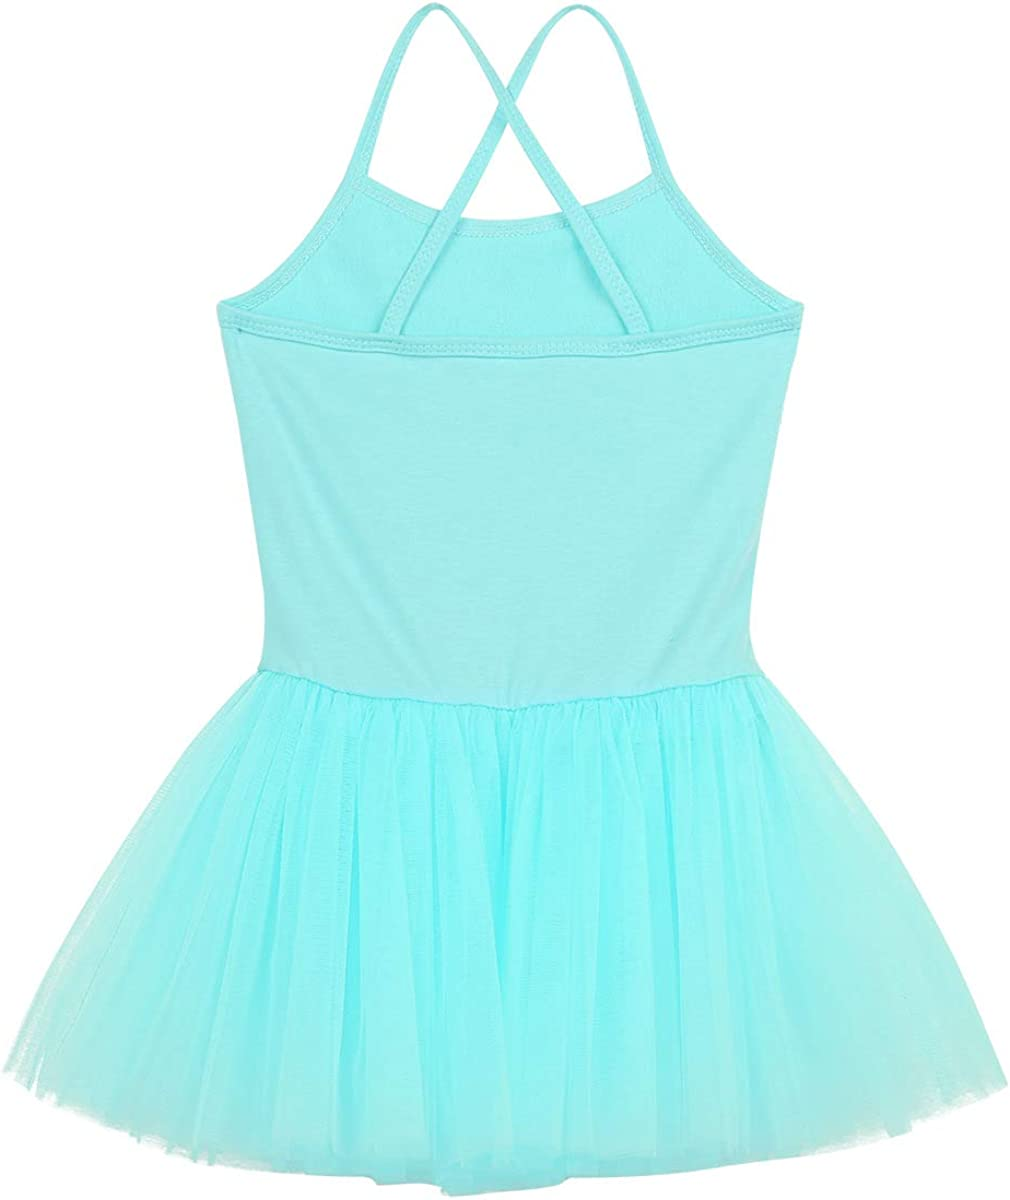 iEFiEL Kids Girls Sequins Camisole Ballet Tutu Dress Ballerina Dance Costume Gymnastics Leotard Bodysuit Dance Dress